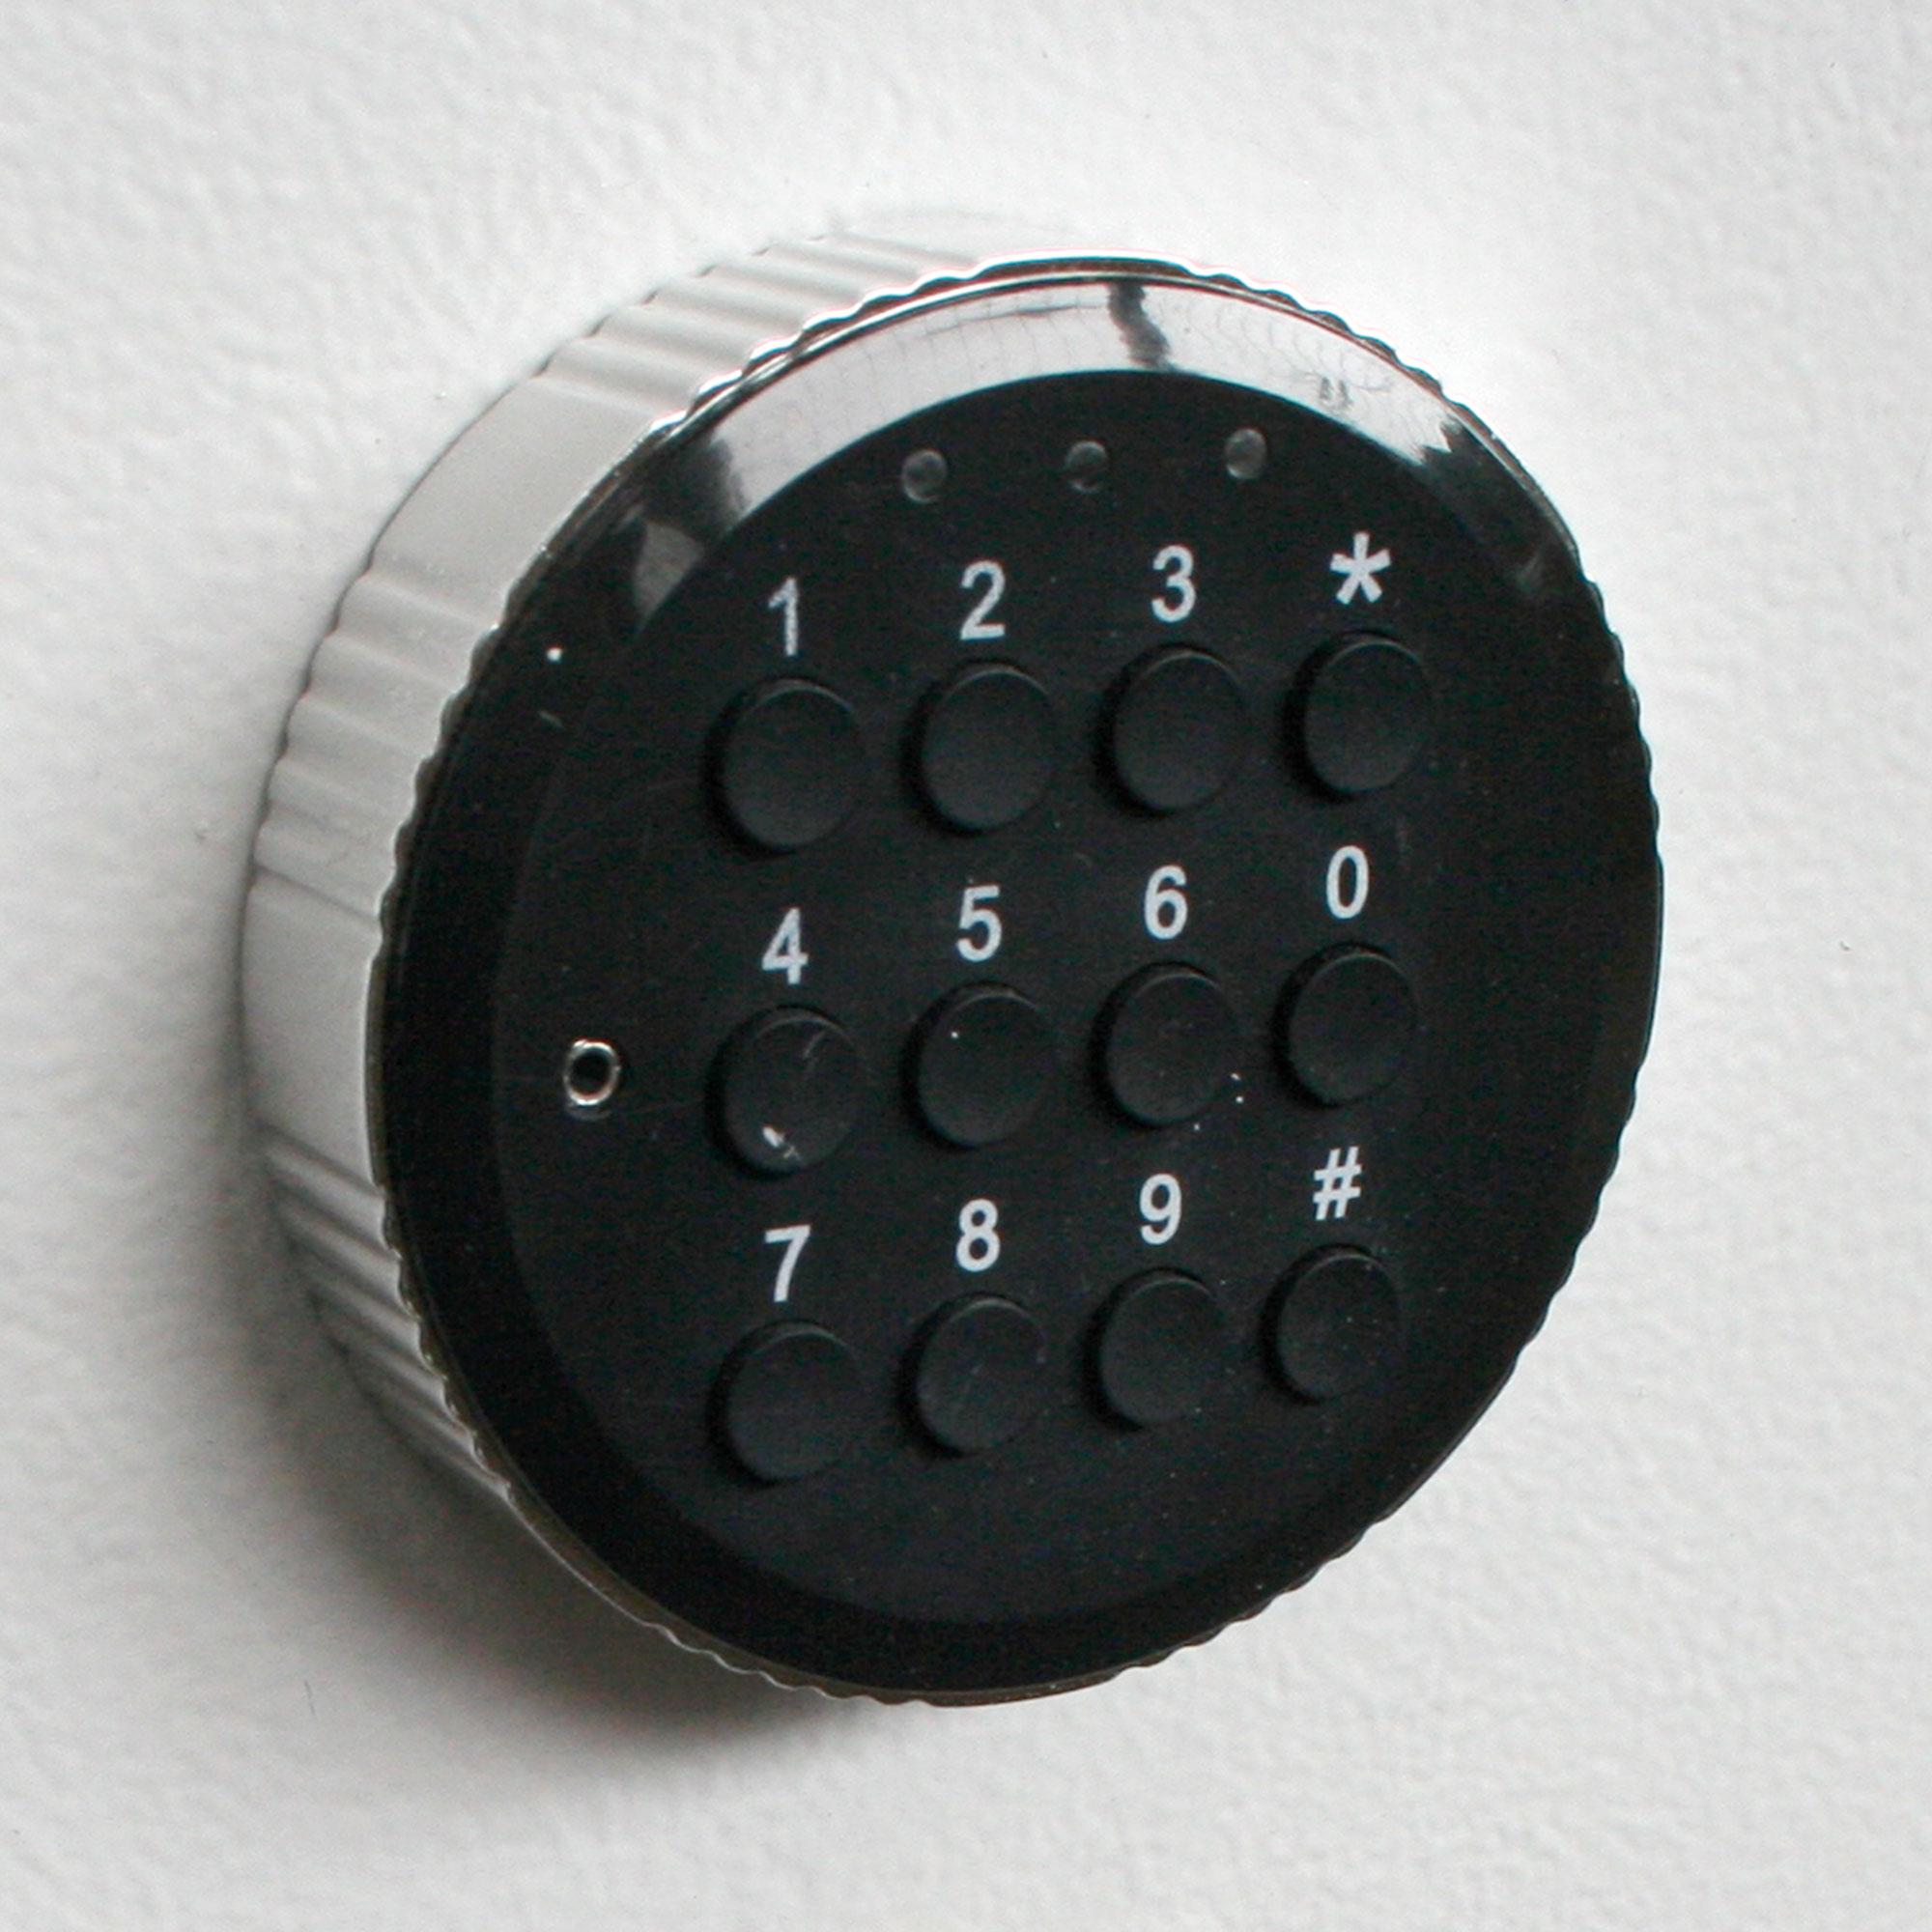 Schlüsseltresor mit 120 Haken, extra lang